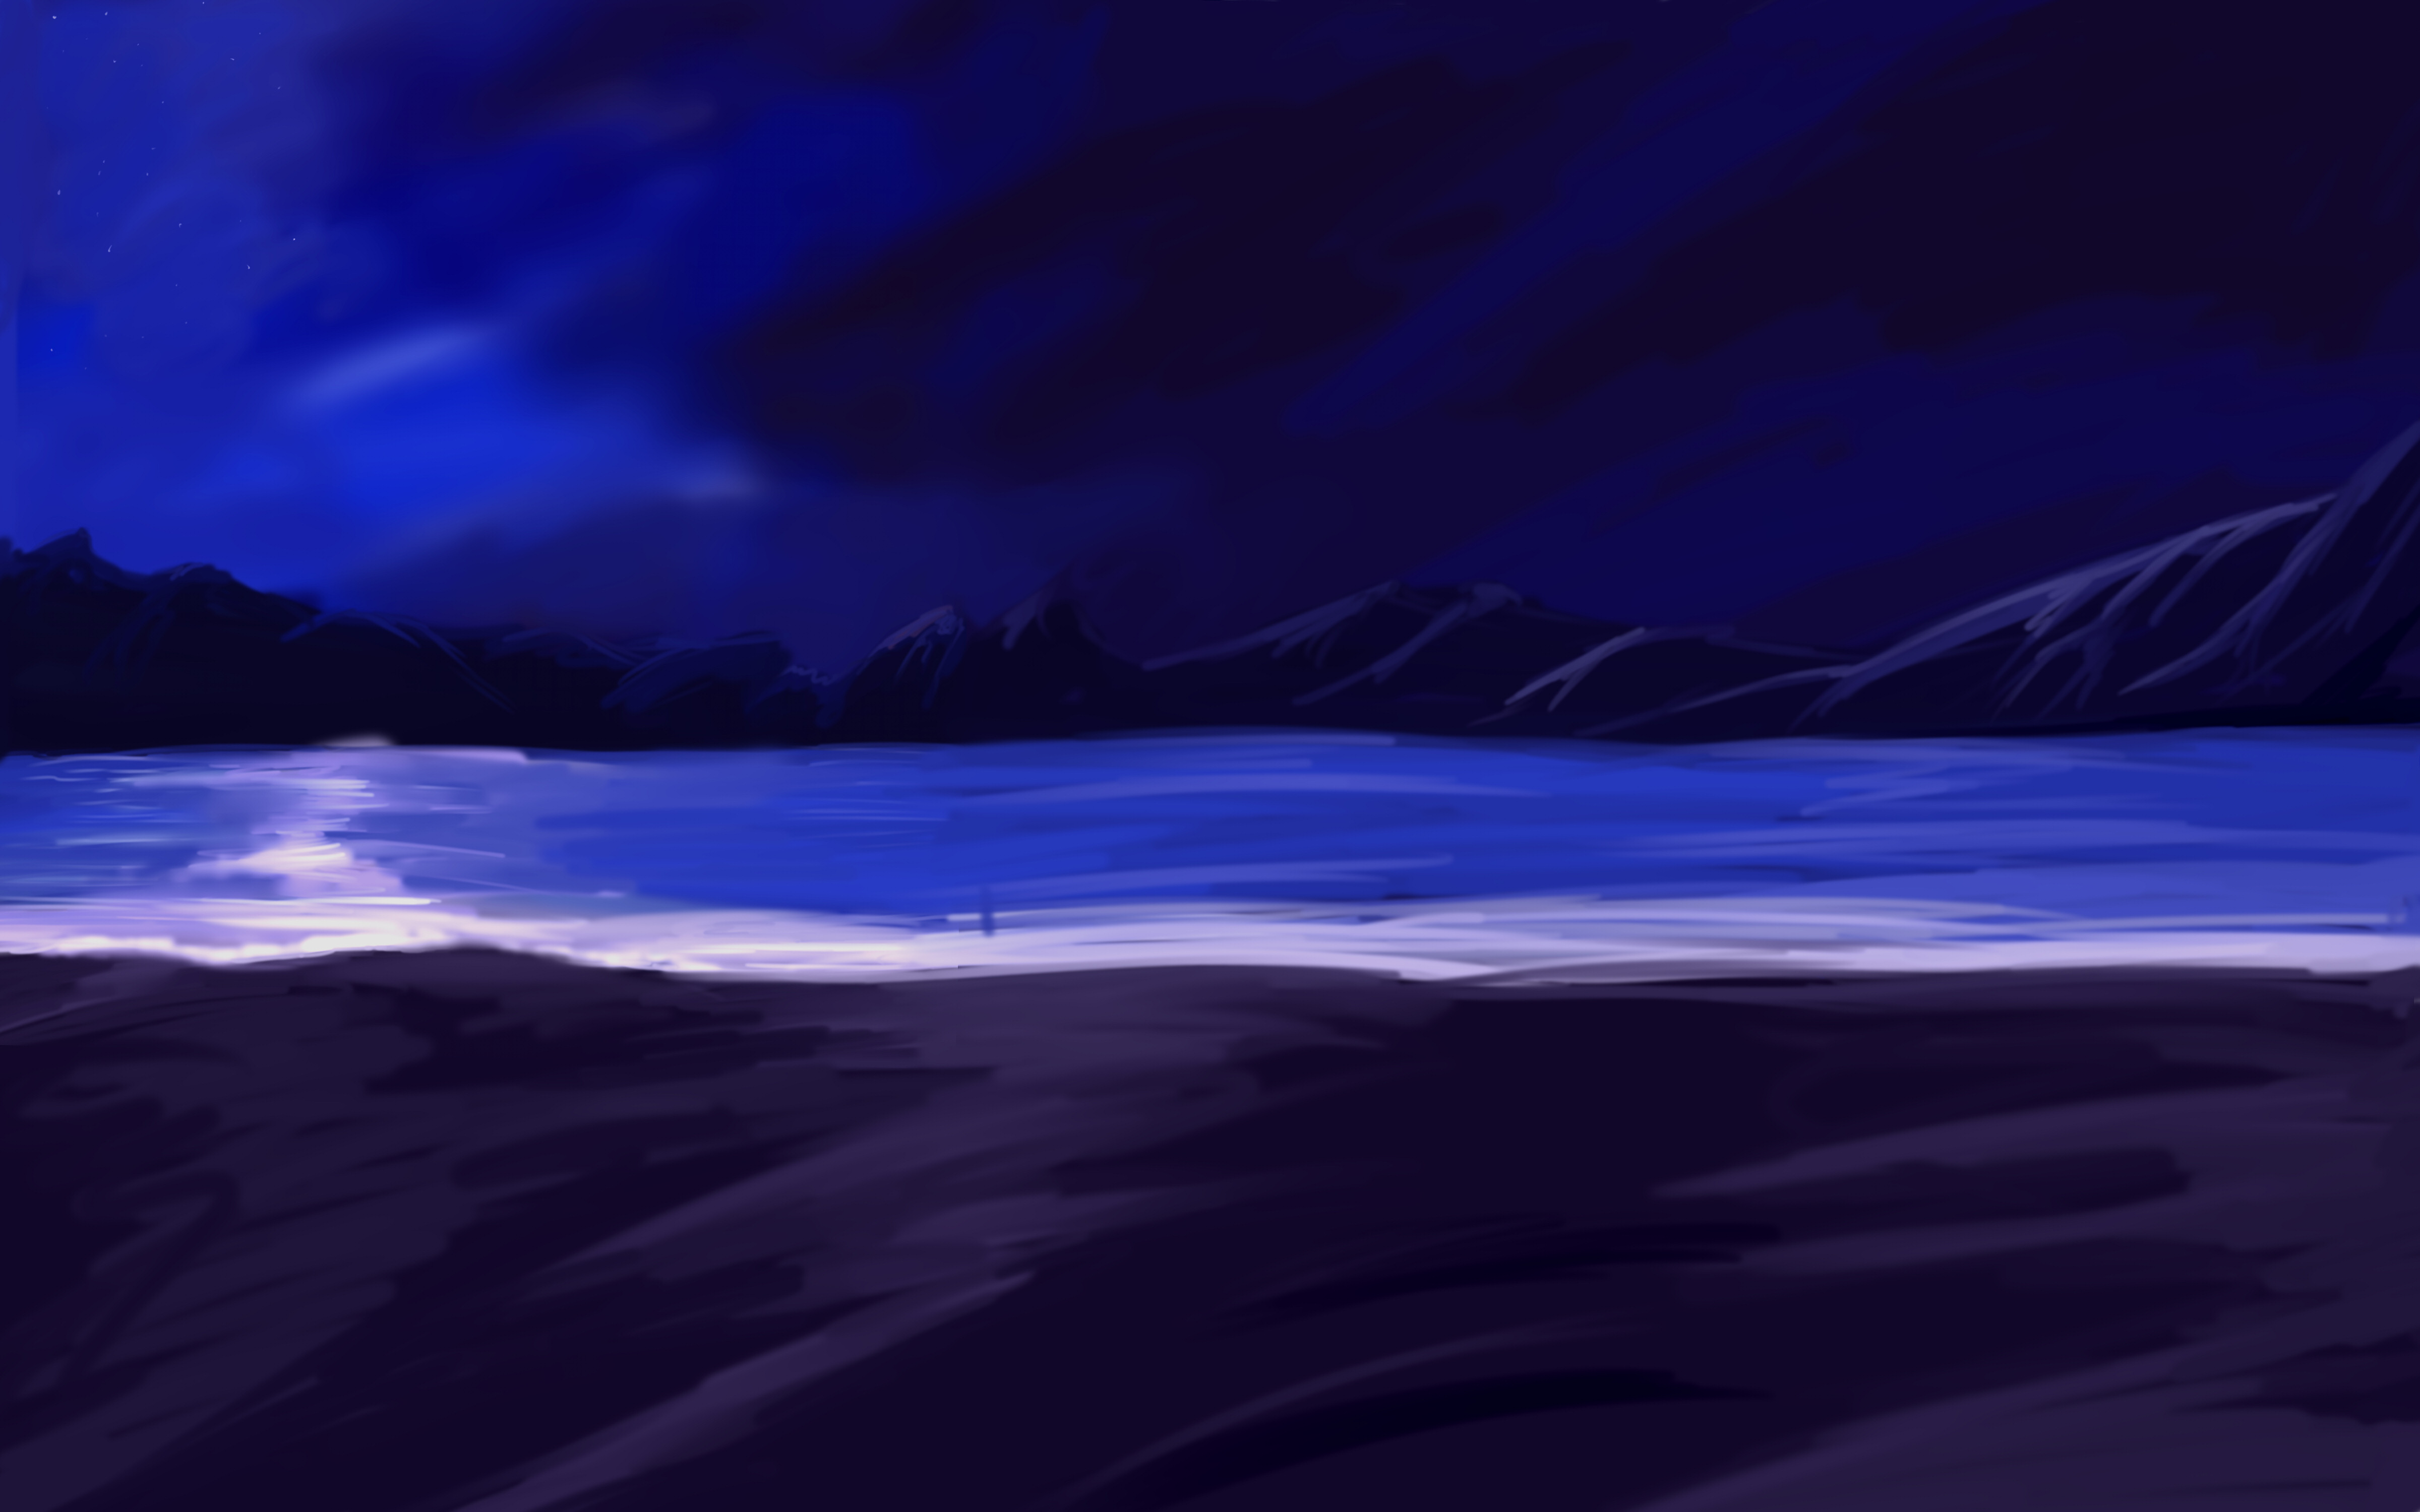 Another Anime Night Beach BG by wbd on DeviantArt